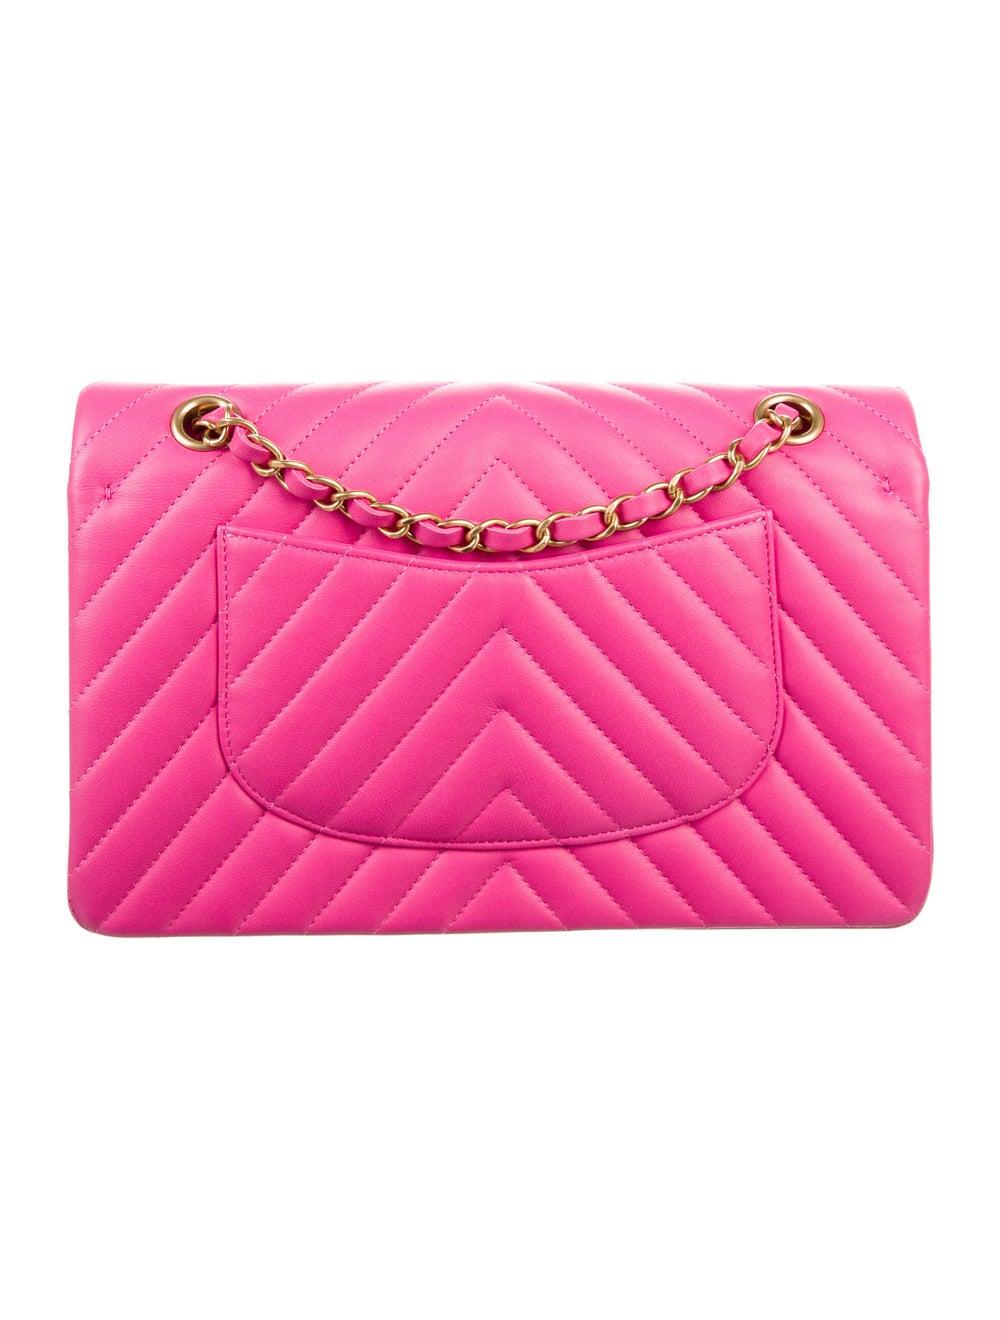 Chanel Chevron Medium Double Flap Bag Pink - image 4